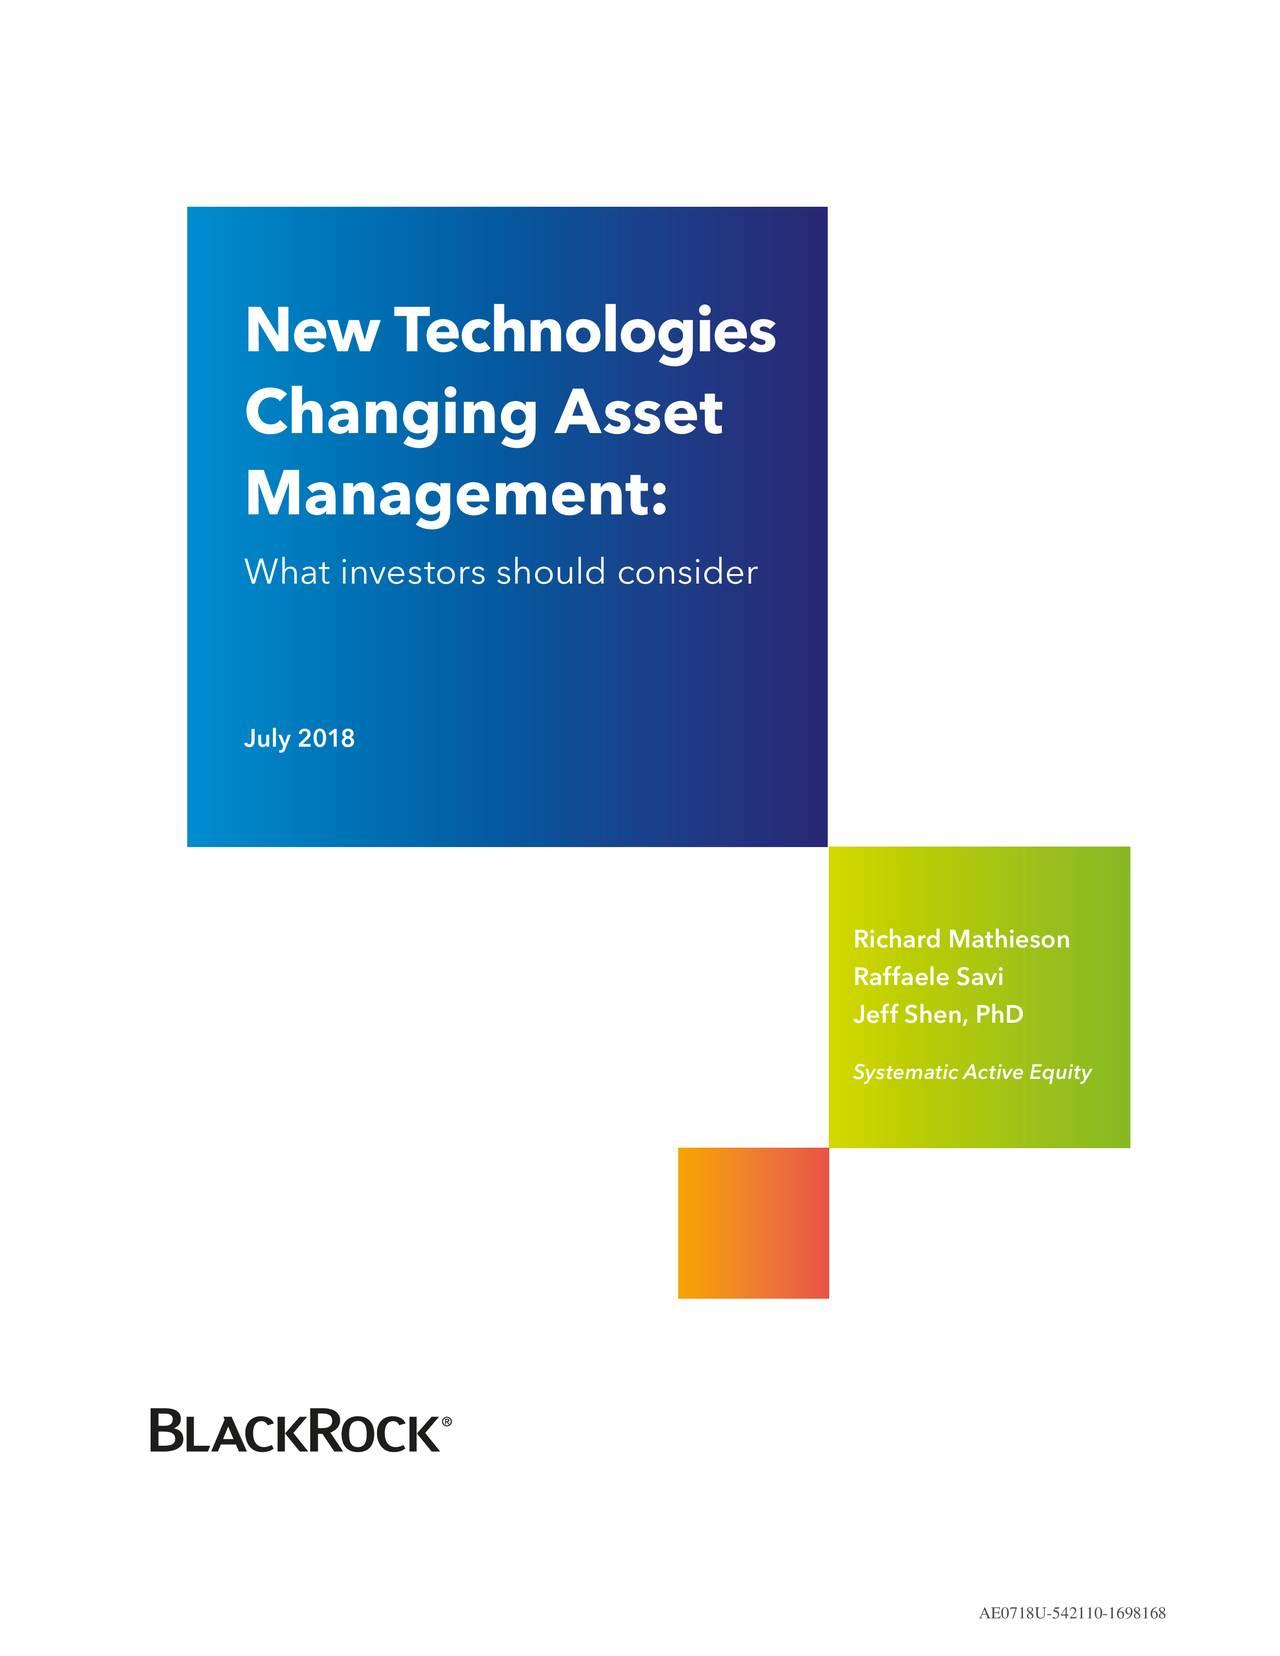 Changing Asset Management: What investors should consider July 2018 Richard Mathieson Raffaele Savi Jeff Shen, PhD Systematic Active Equity AE0718U-542110-1698168